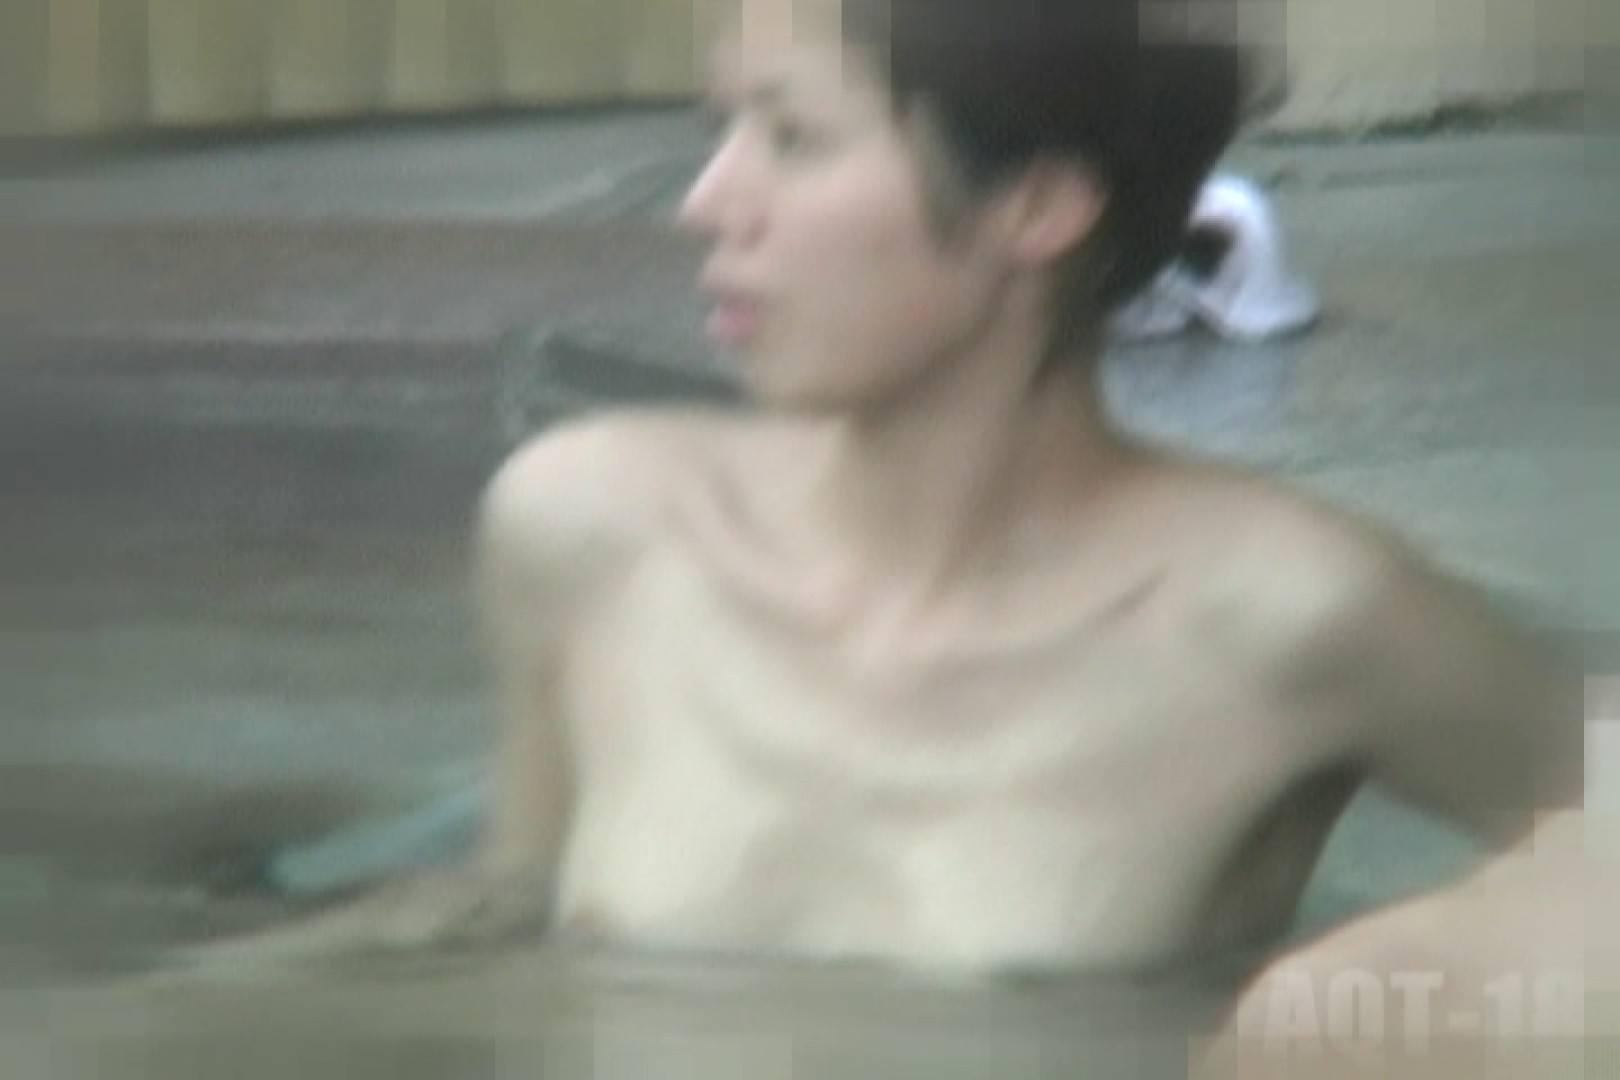 Aquaな露天風呂Vol.856 OLのエロ生活 SEX無修正画像 74連発 53